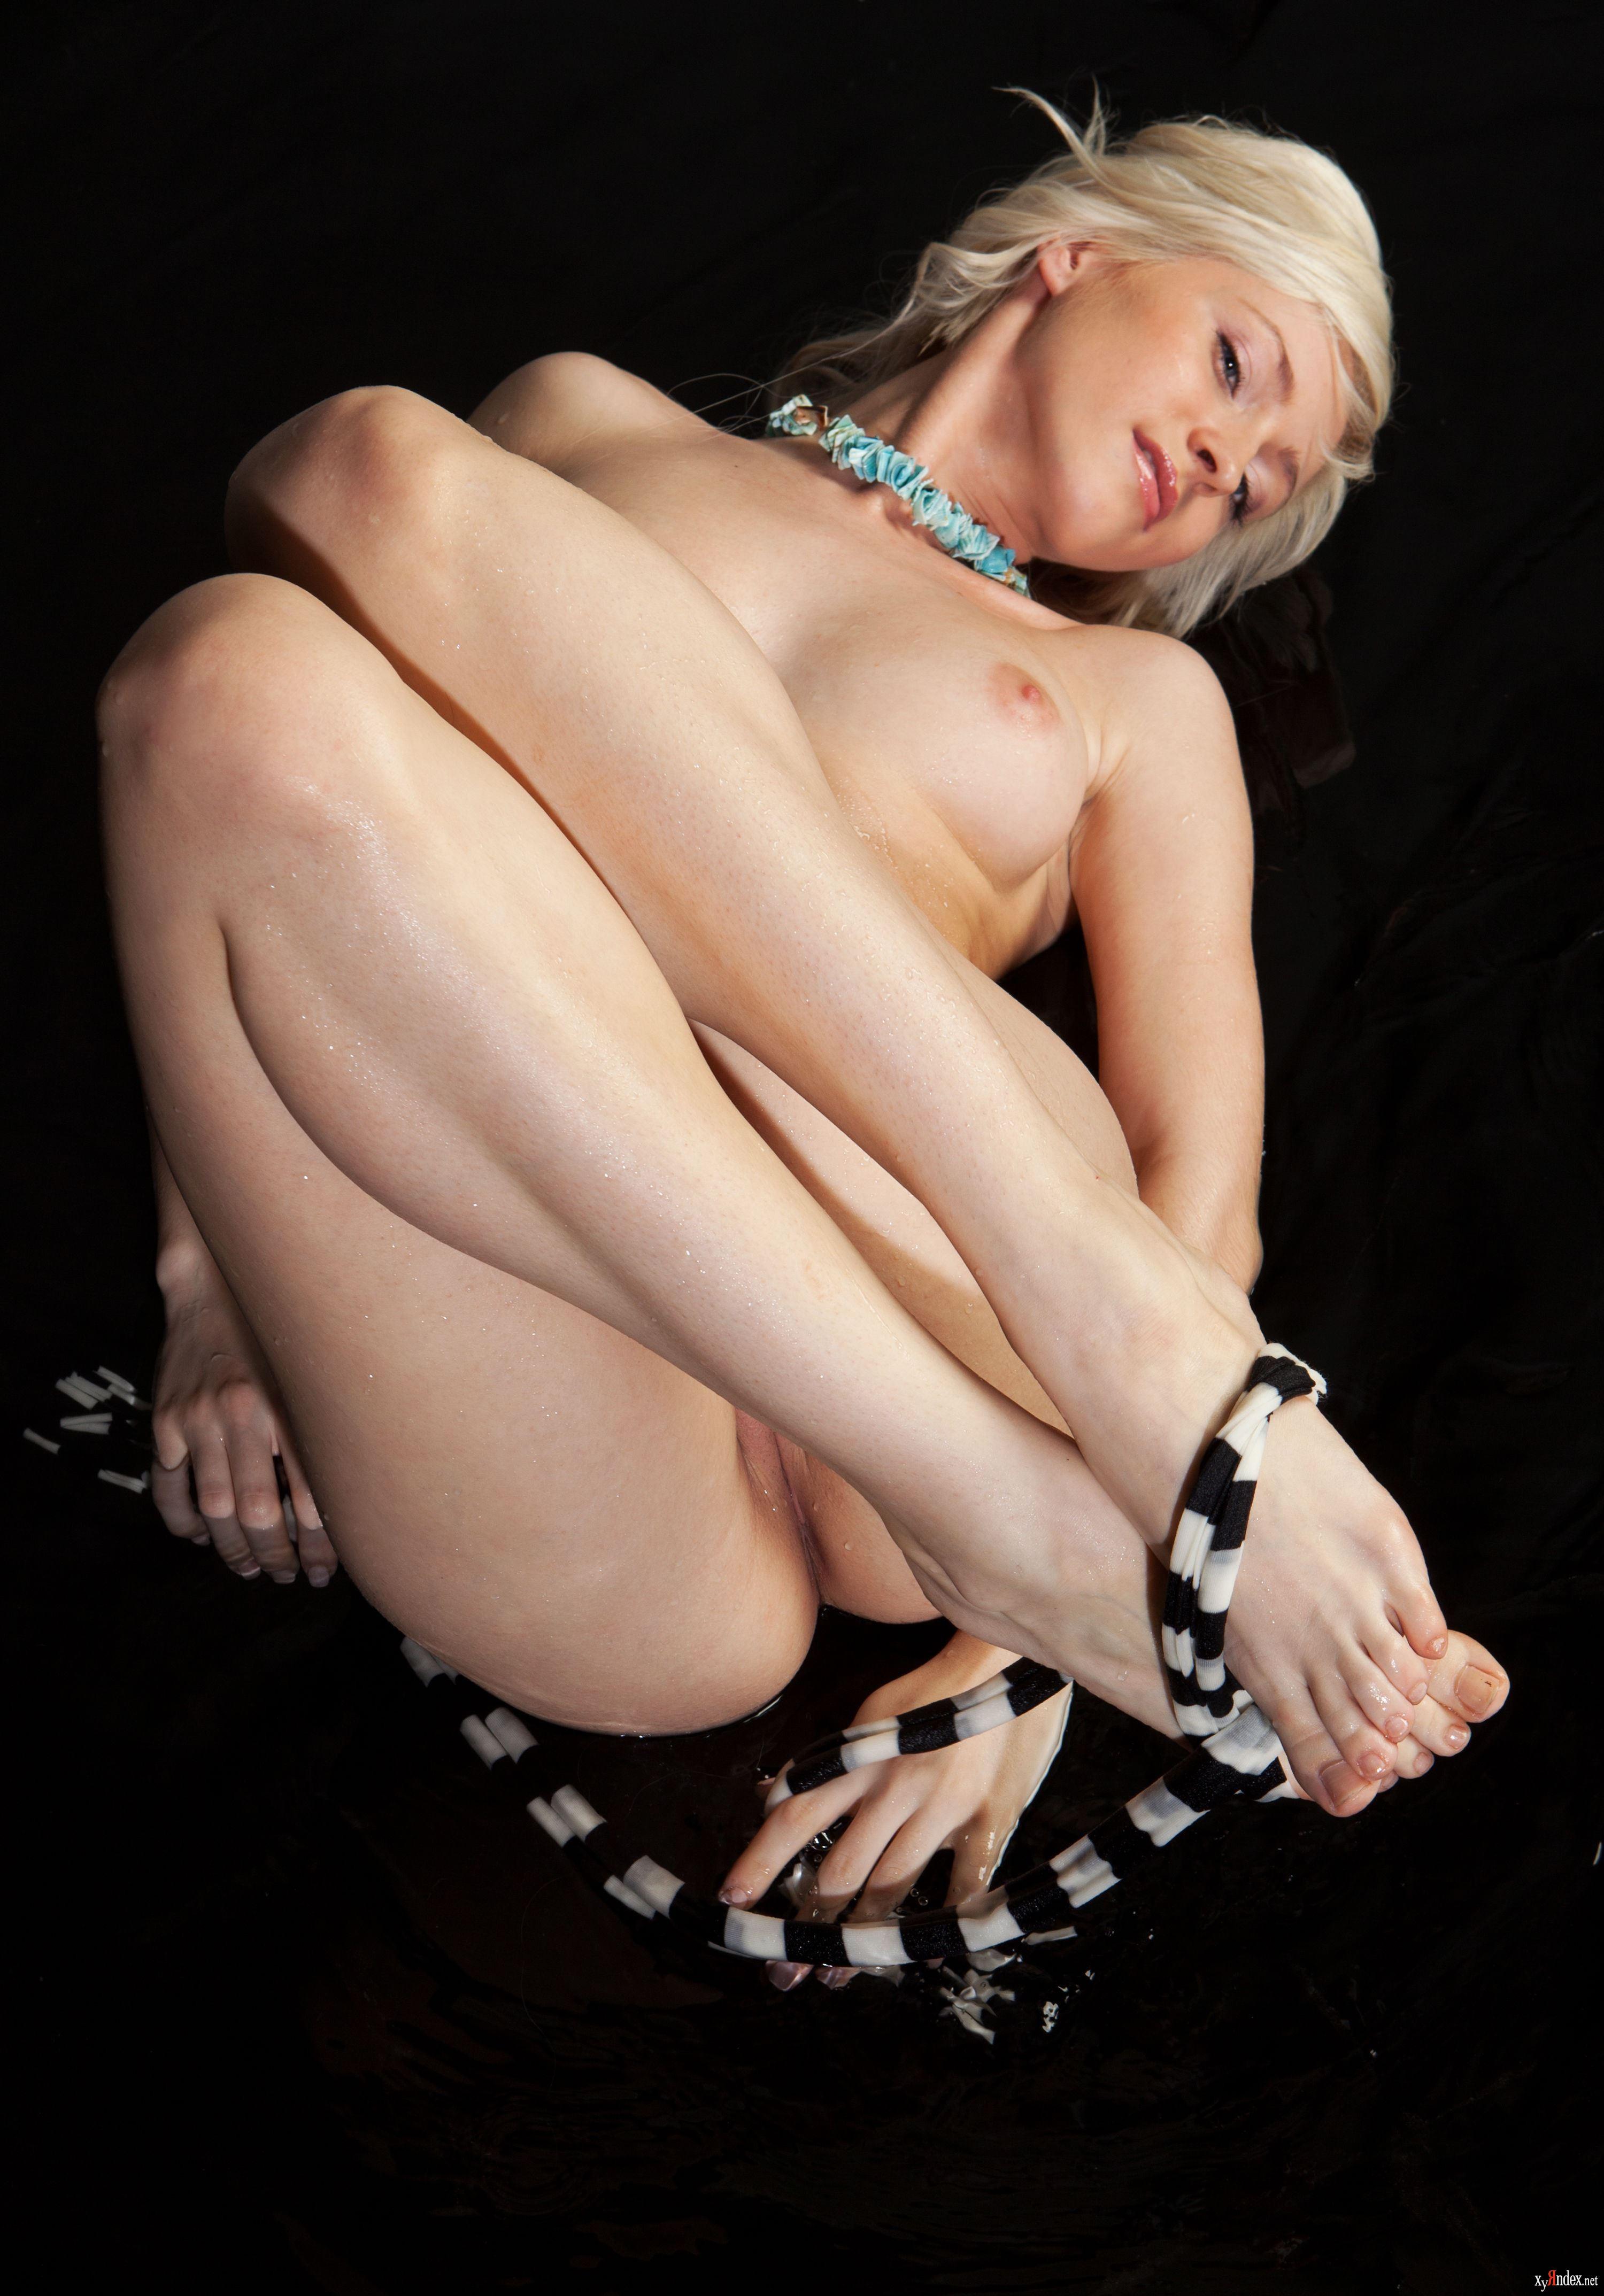 Janelle casanave nude pics